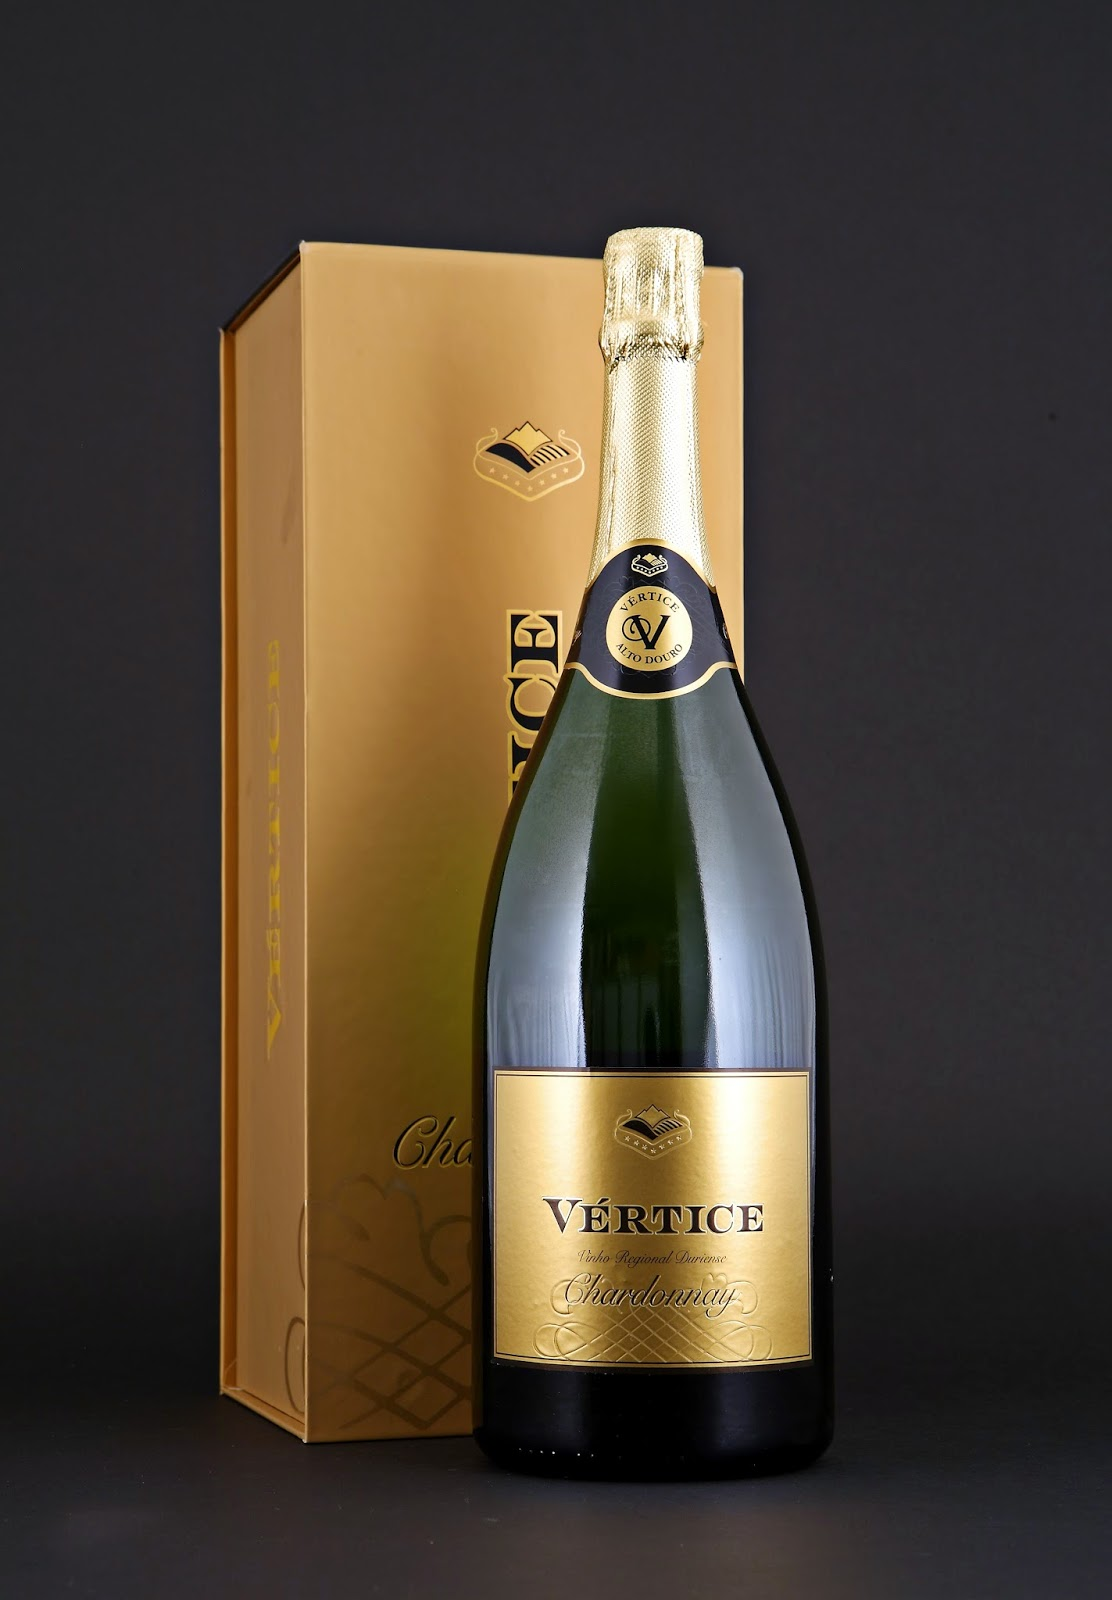 Vértice Chardonnay 2009